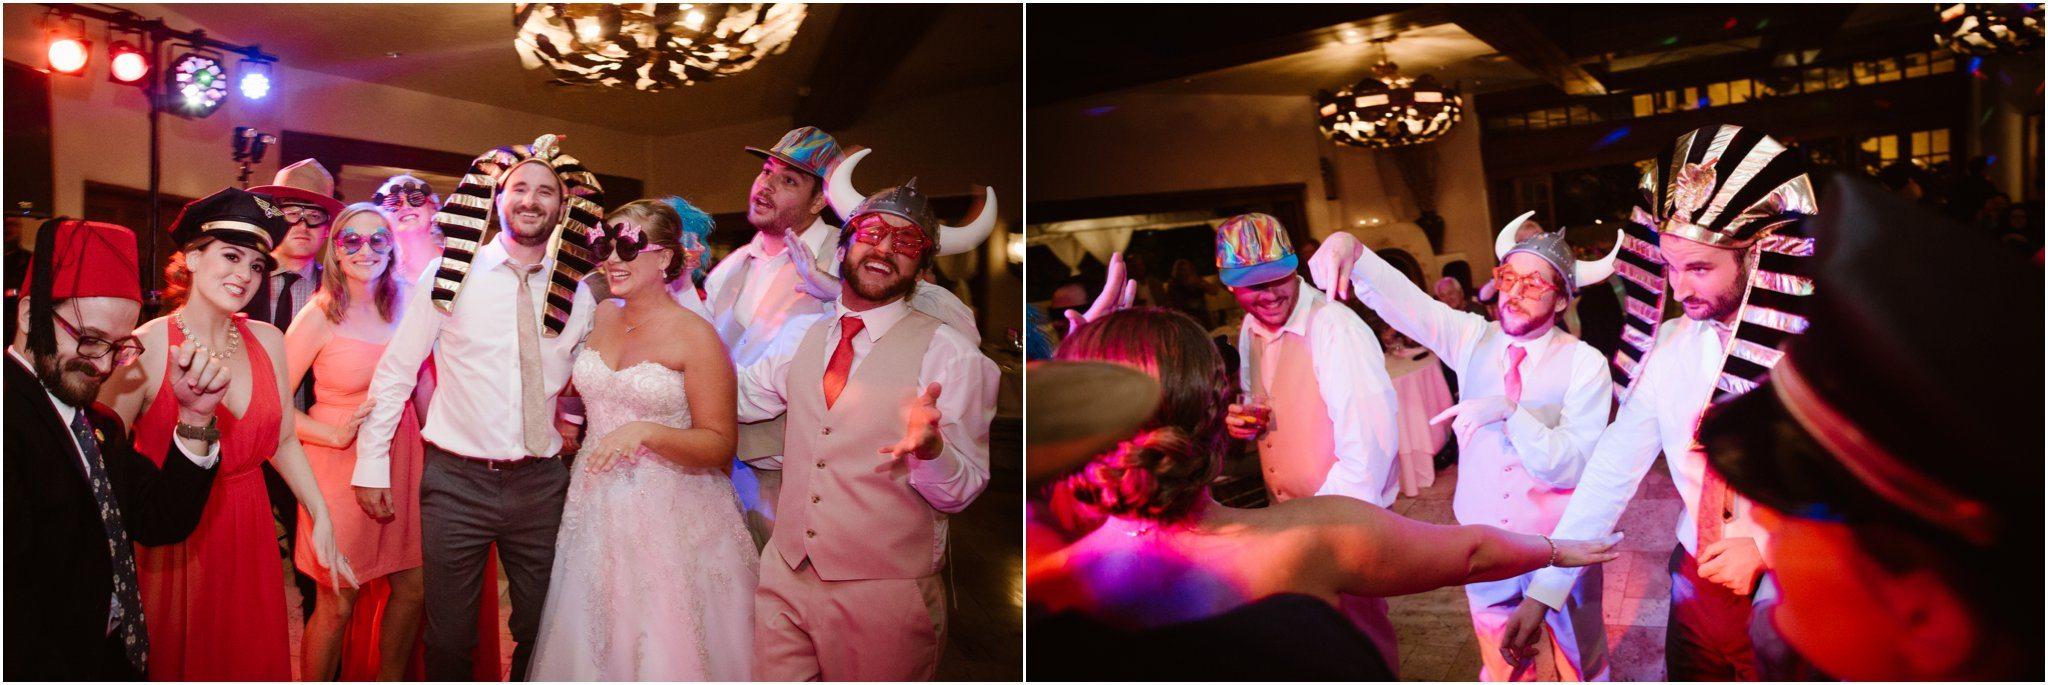 0091albuquerque-wedding-photographer_-santa-fe-wedding-photographer_-southwest-wedding-photography_-blue-rose-studio